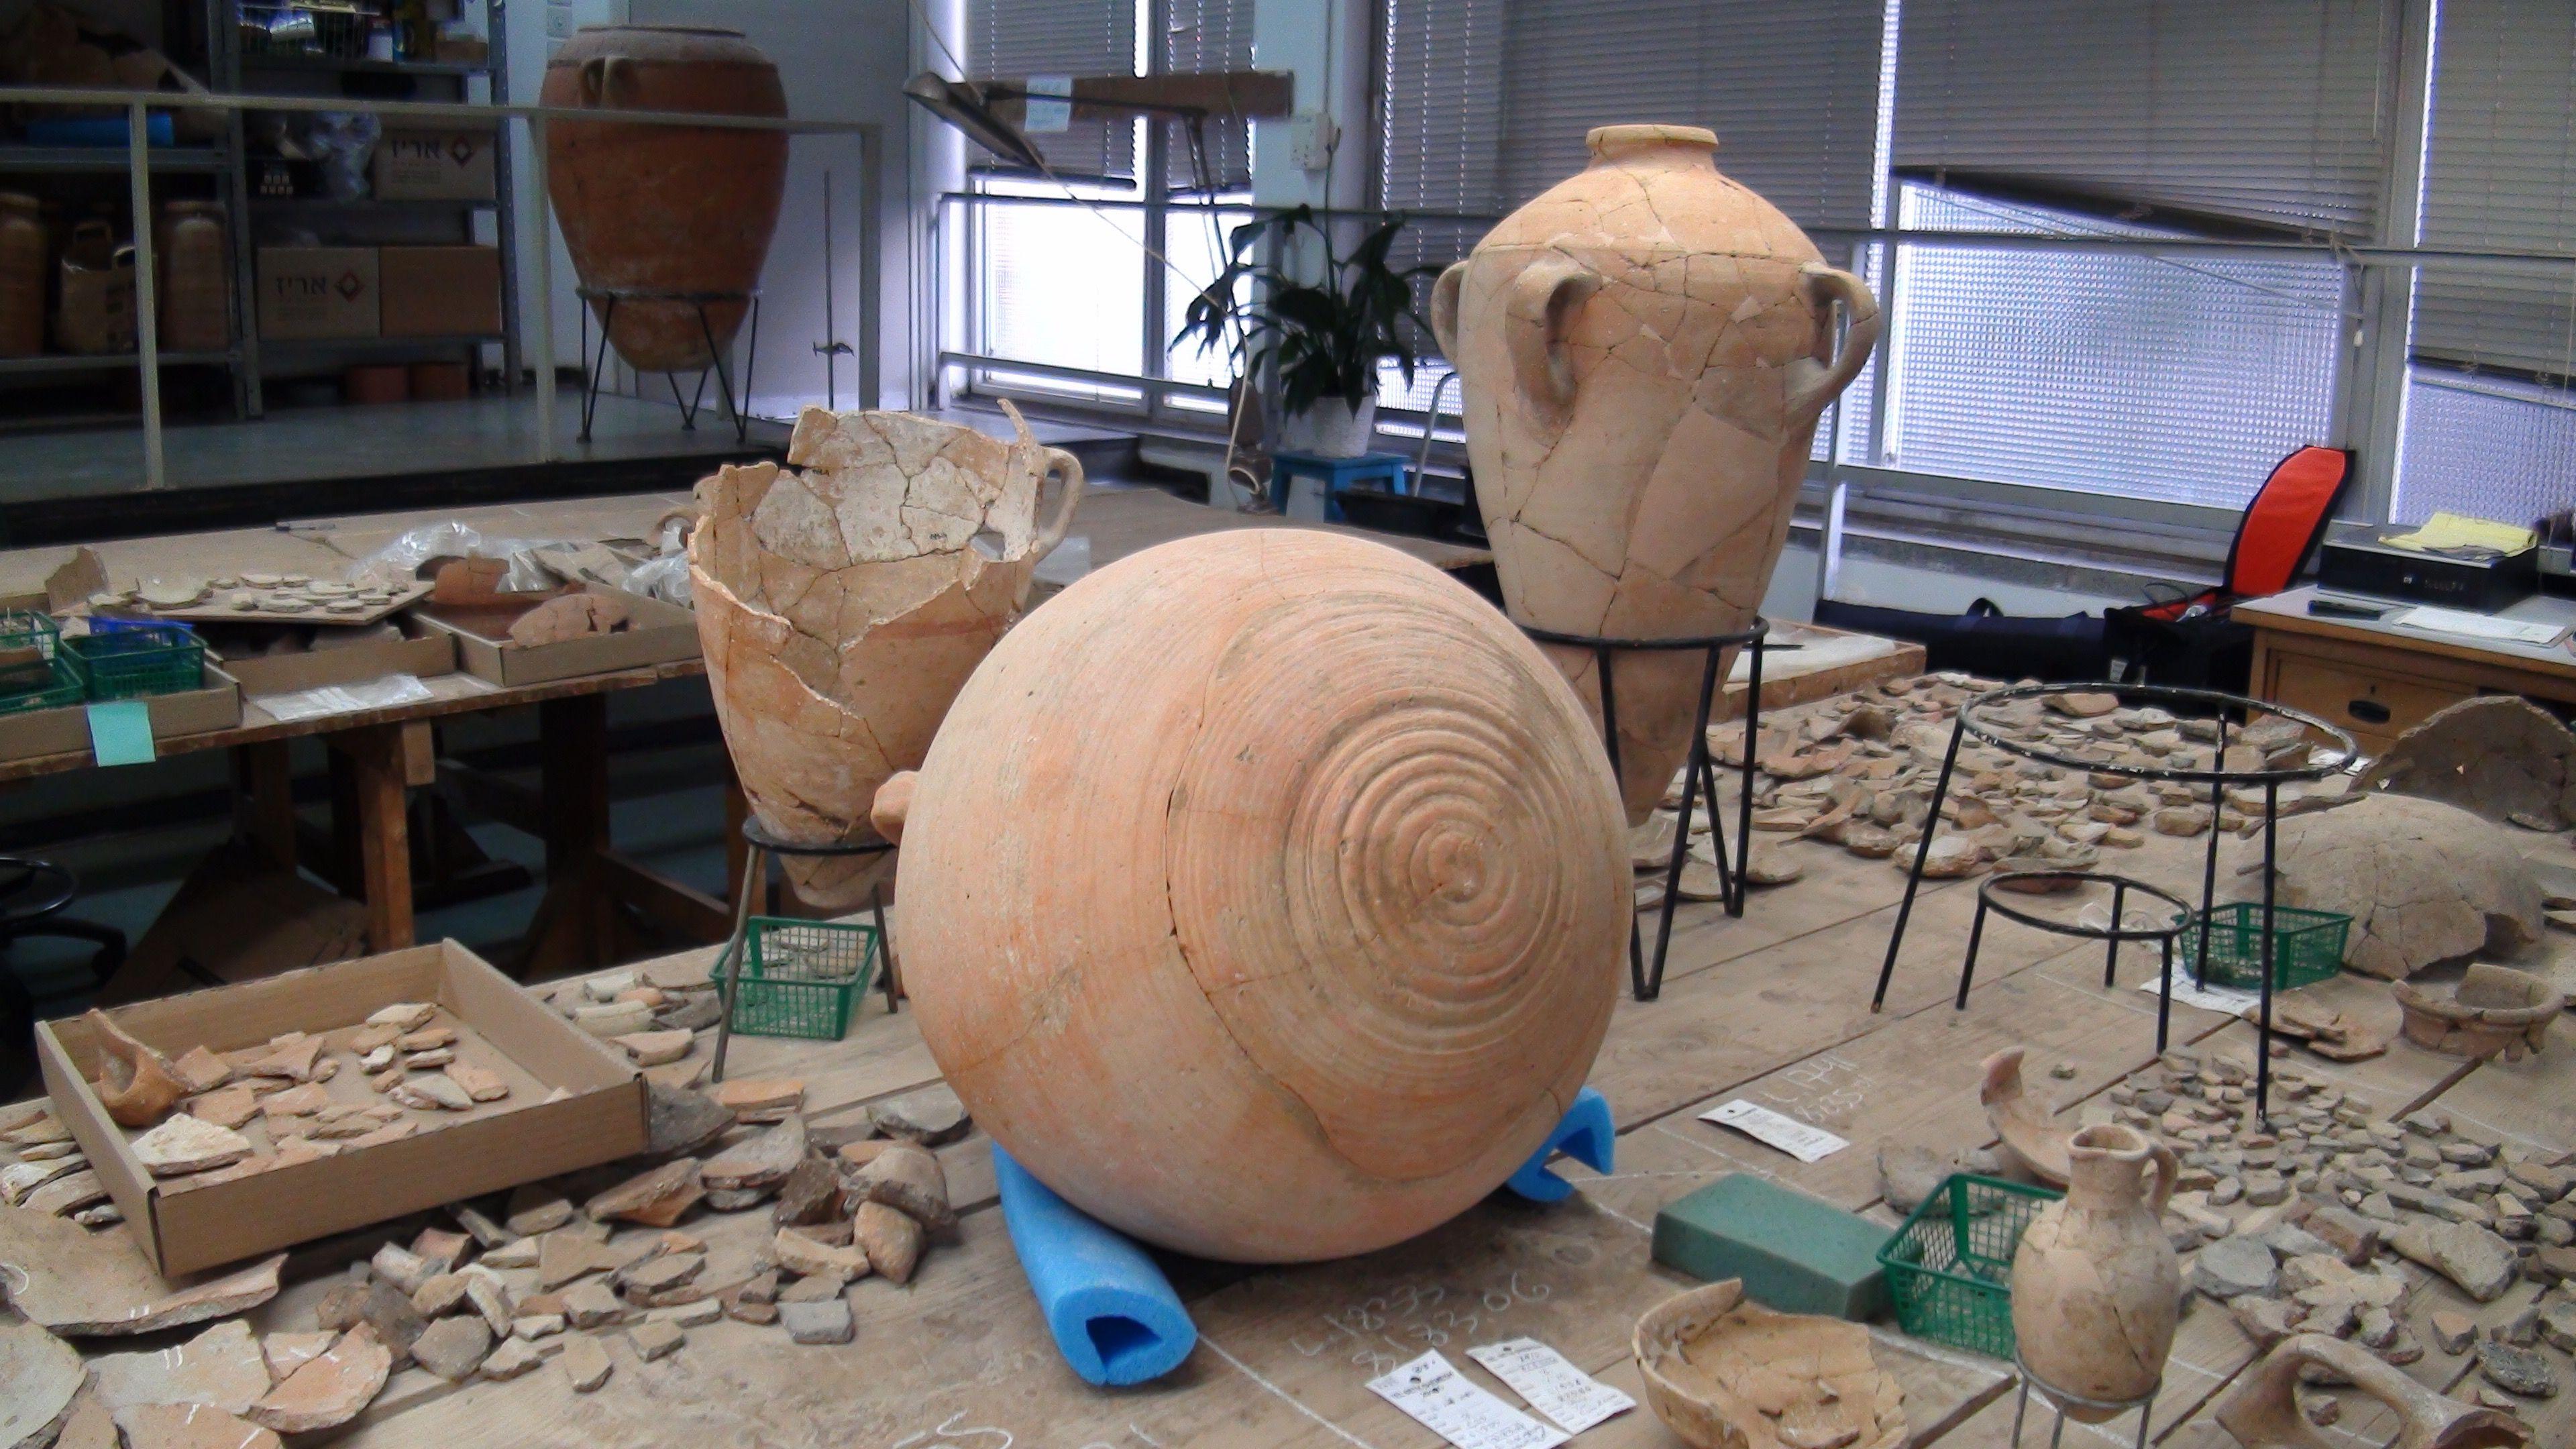 Roman storage jar undergoing a restoration process